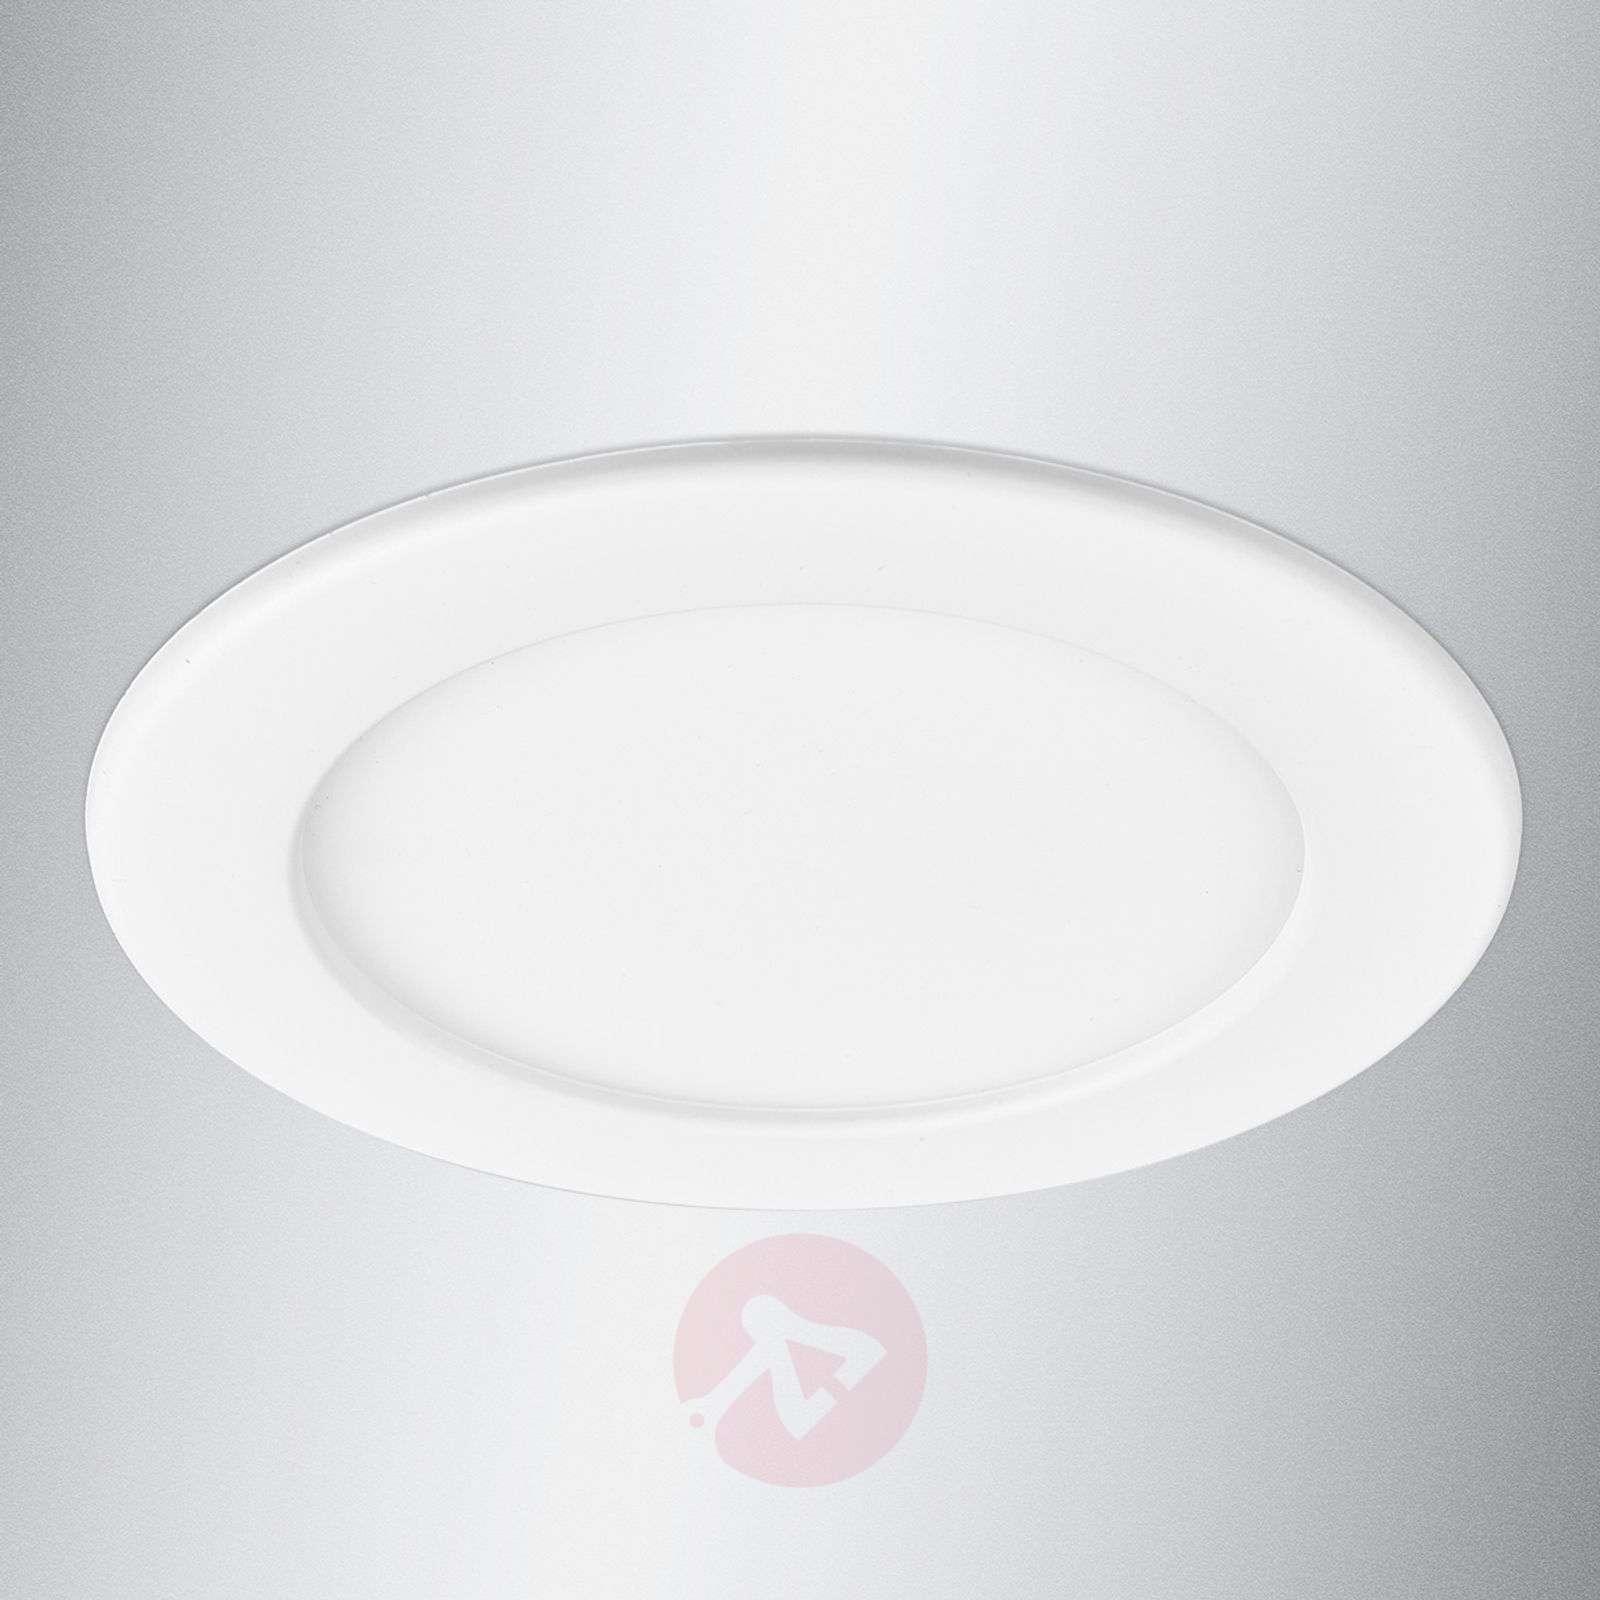 LED recessed spotlight Editha for bathrooms, 10.5W-9978014-012